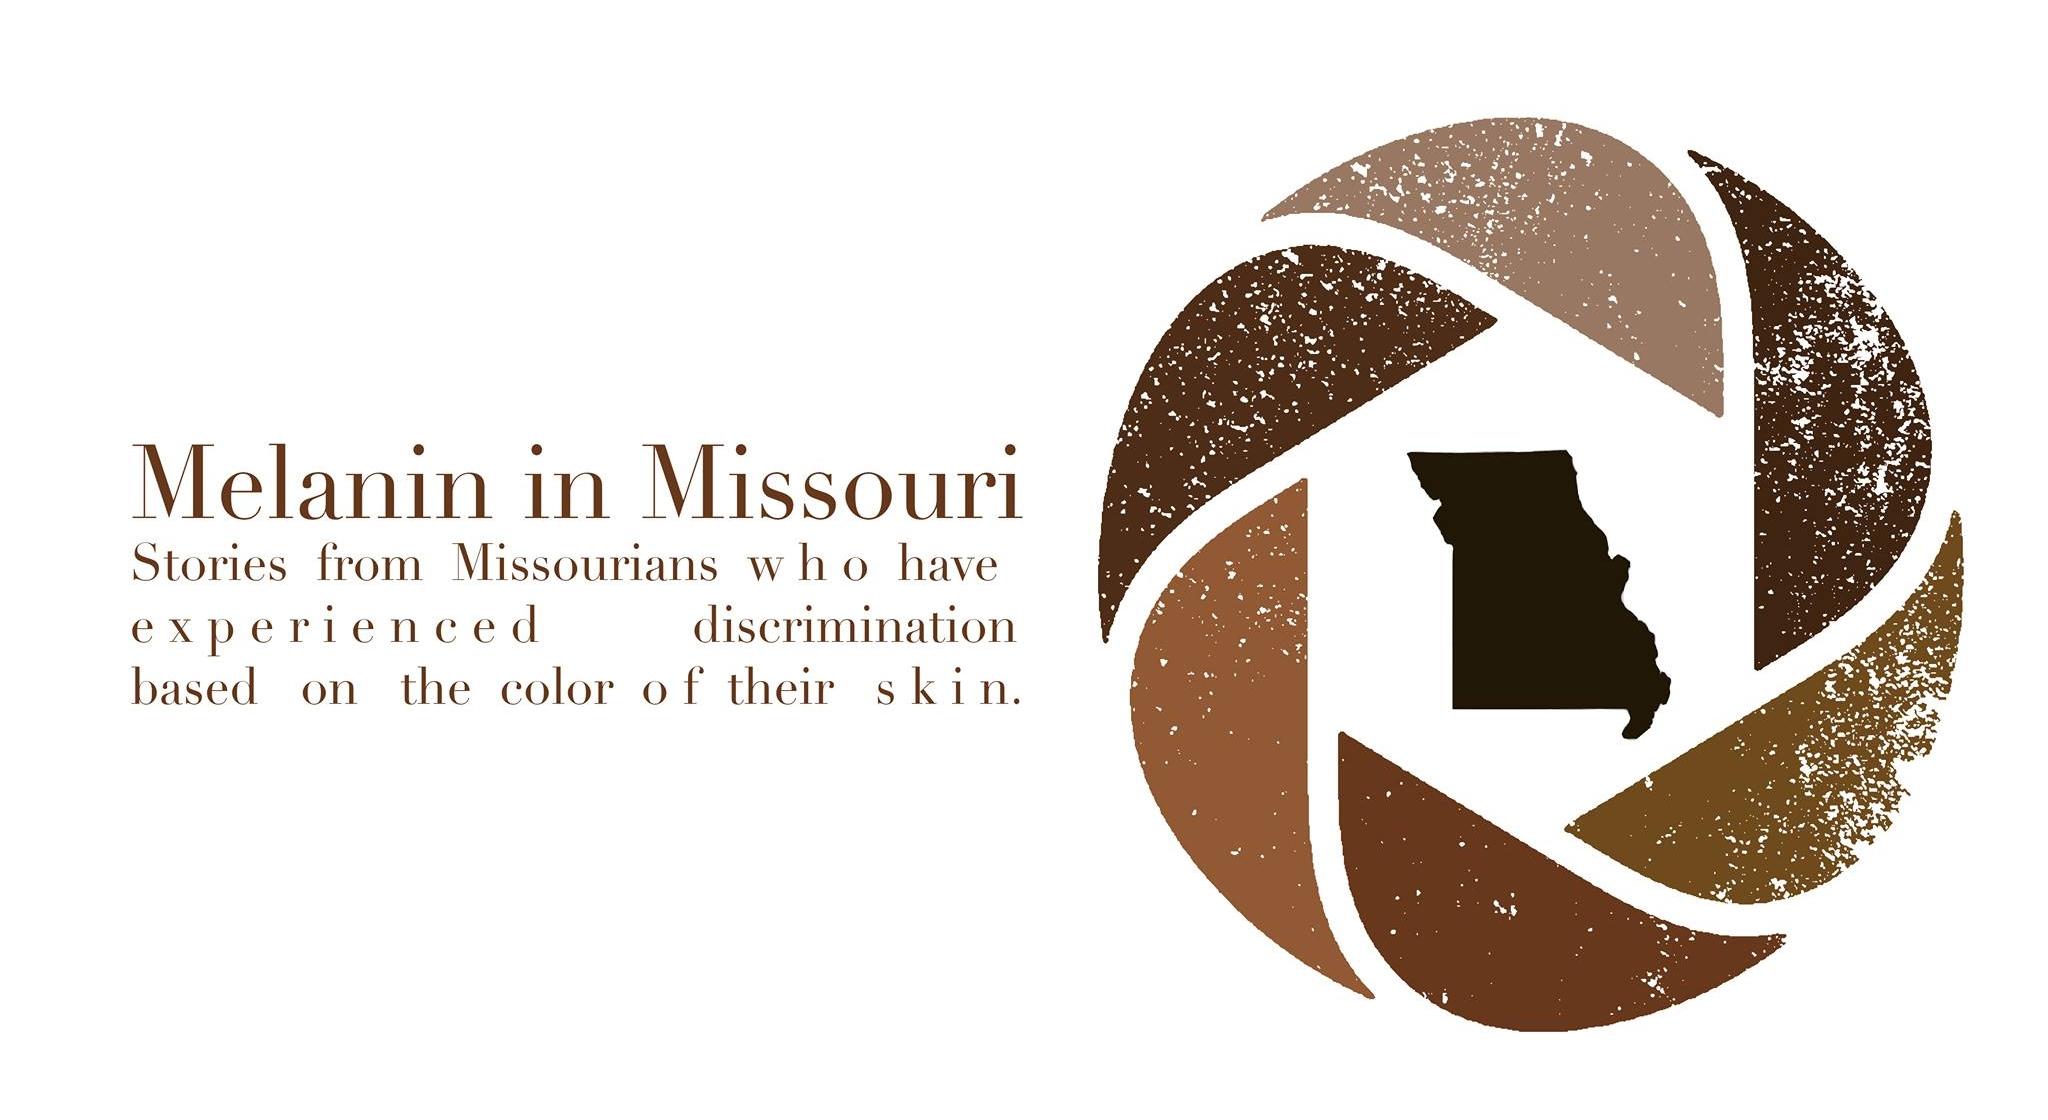 Melanin in Missouri